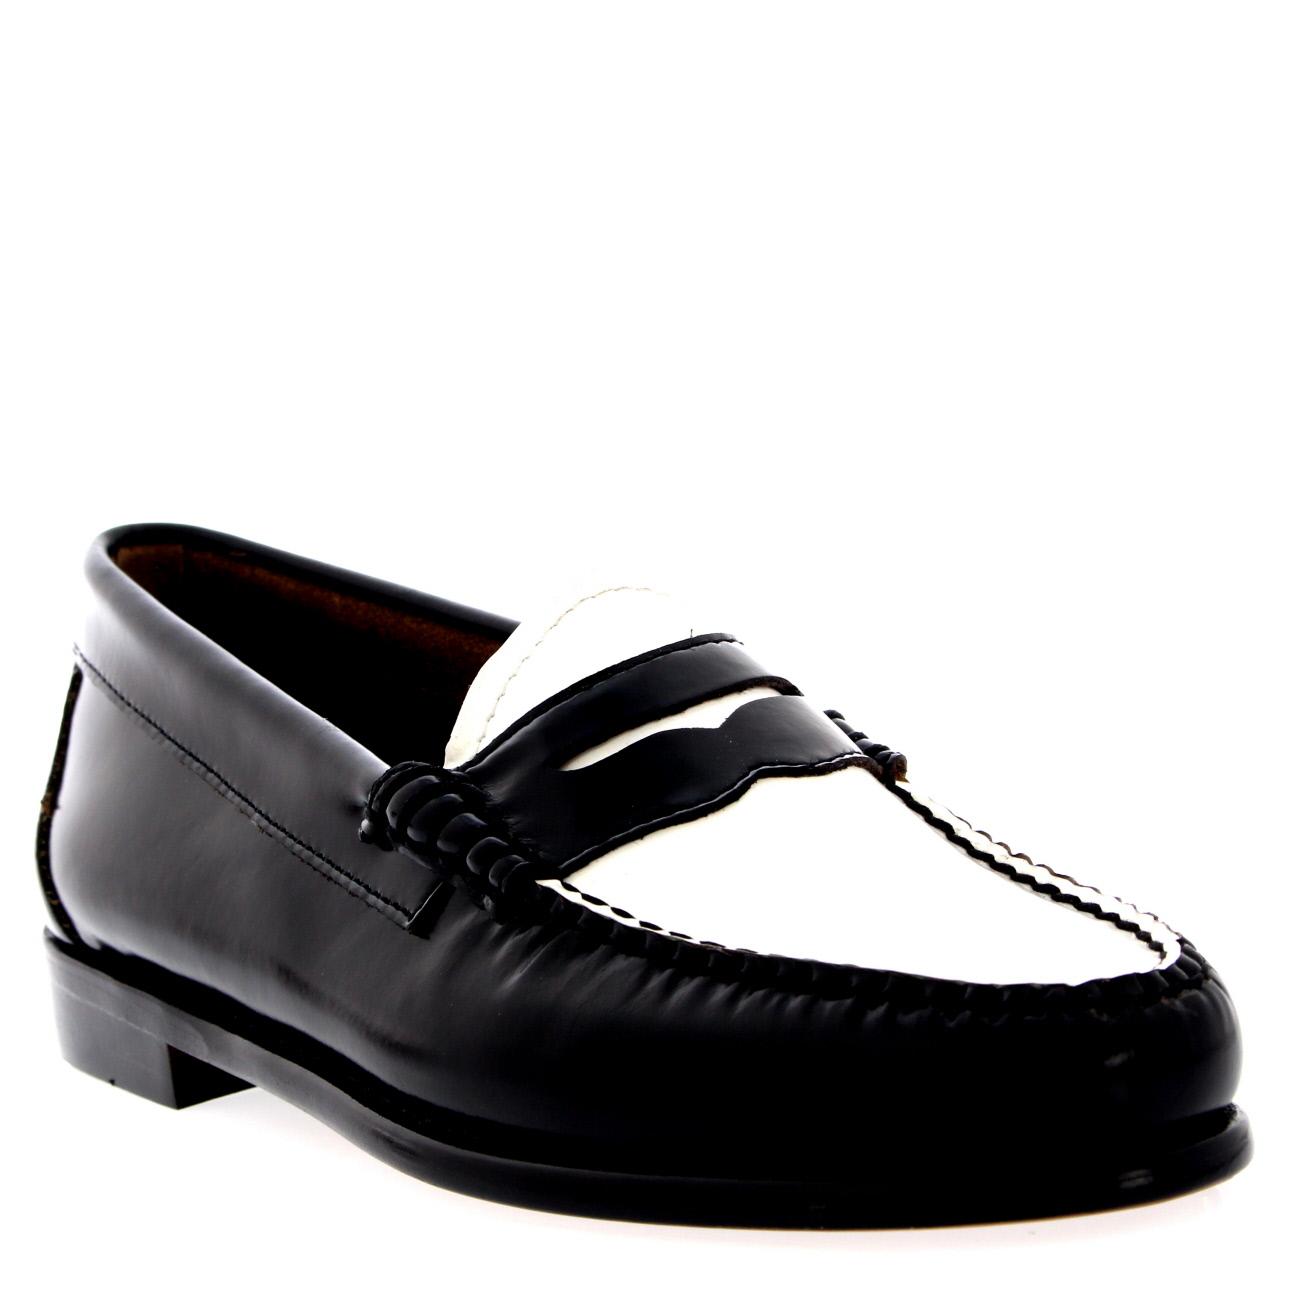 Damenschuhe G.H Work Bass Weejuns Penny Leder Smart Loafers Office Work G.H Schuhes UK 3-9 2c4532